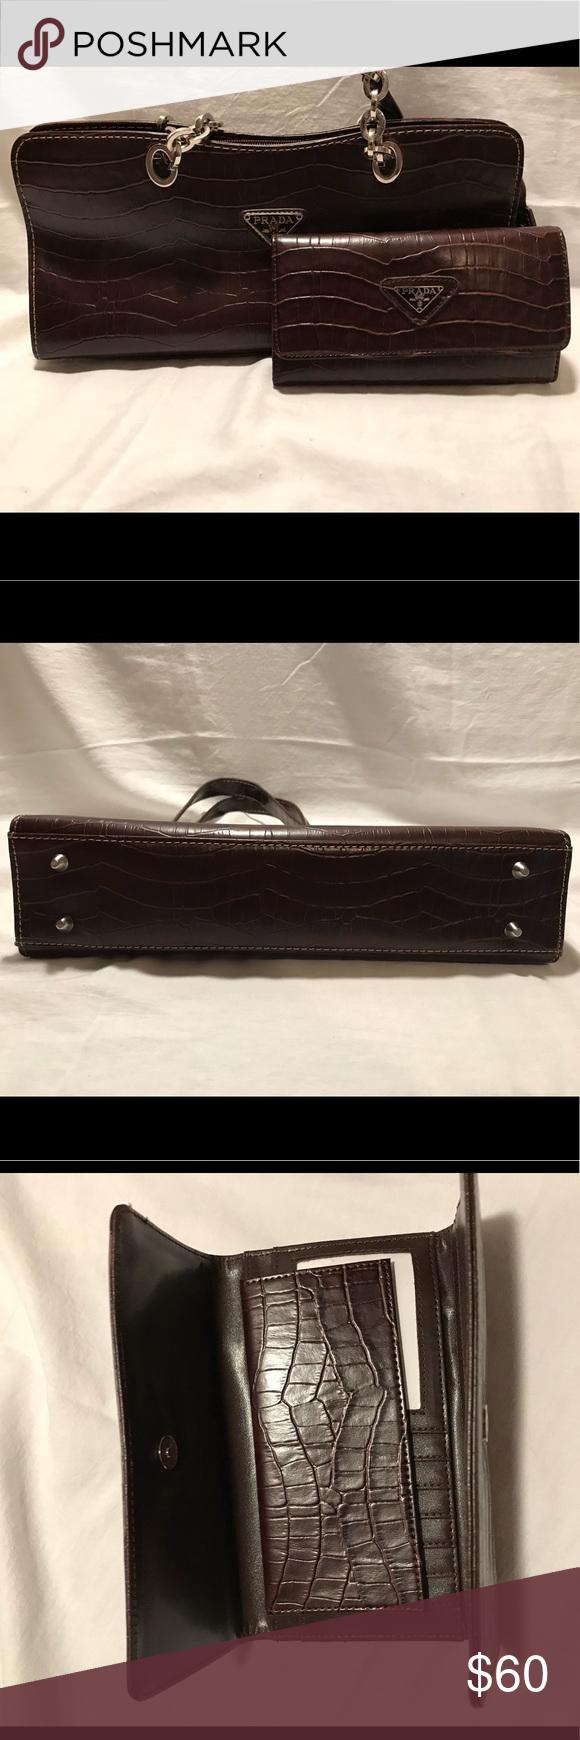 56ac7fa67602 ... free shipping prada alligator bag with clutch vintage prada alligator  purse with clutch. i can